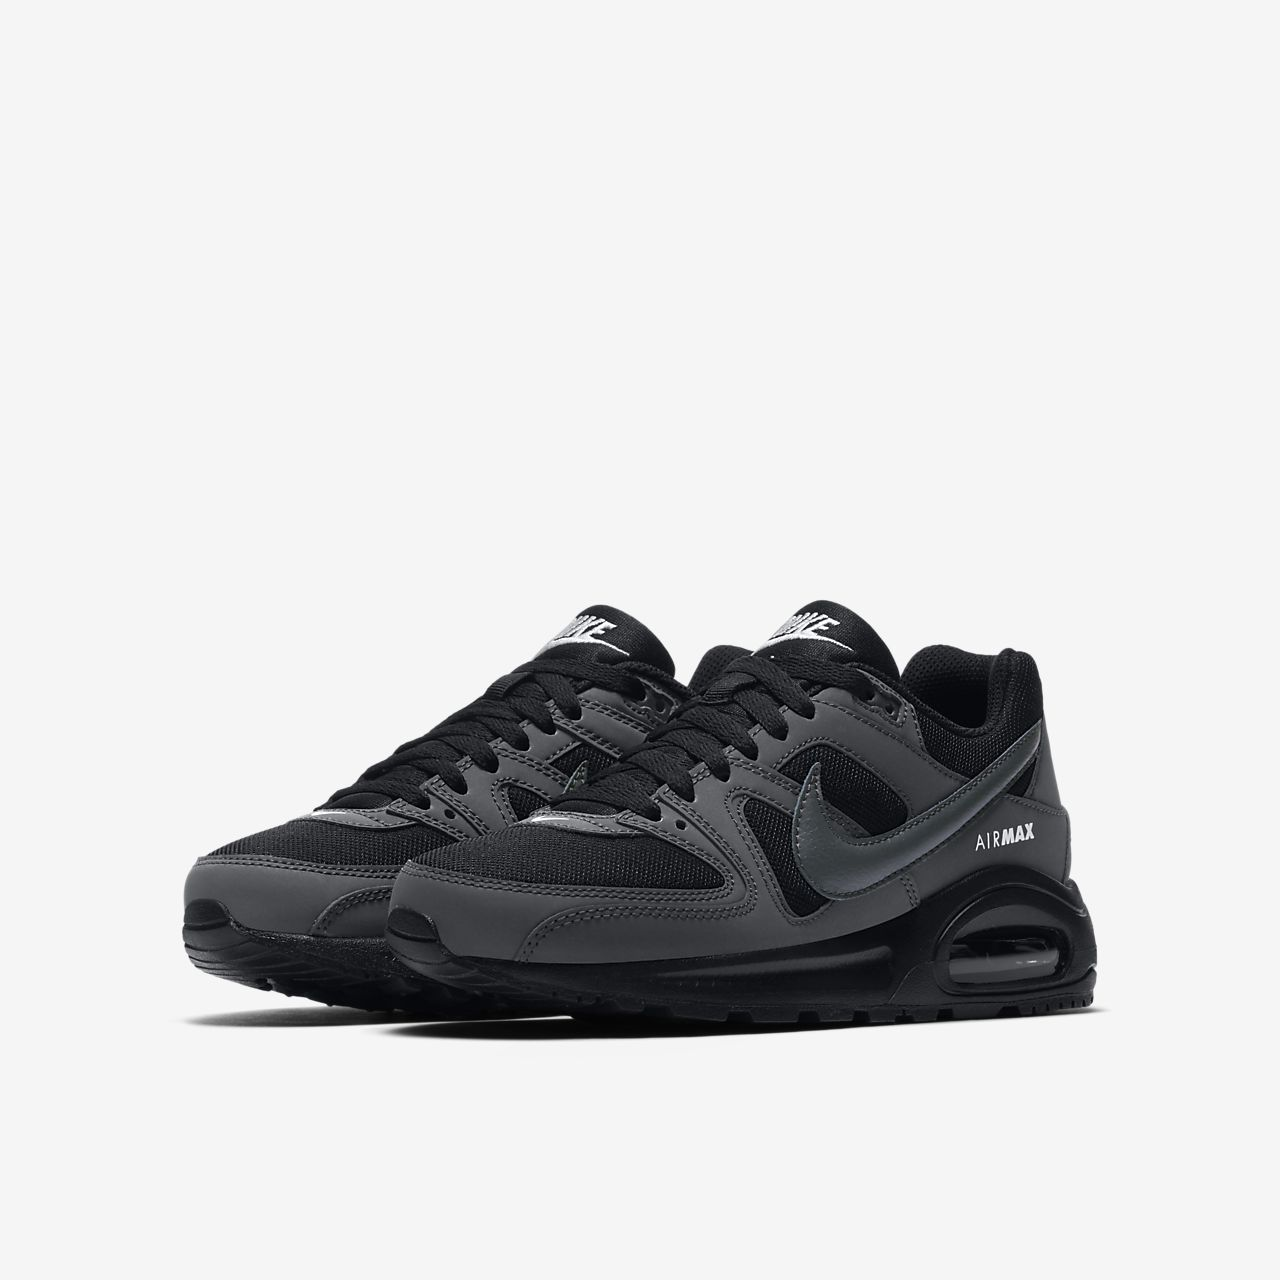 c3452ed91a9 Nike Air Max Command Flex Older Kids  Shoe. Nike.com GB